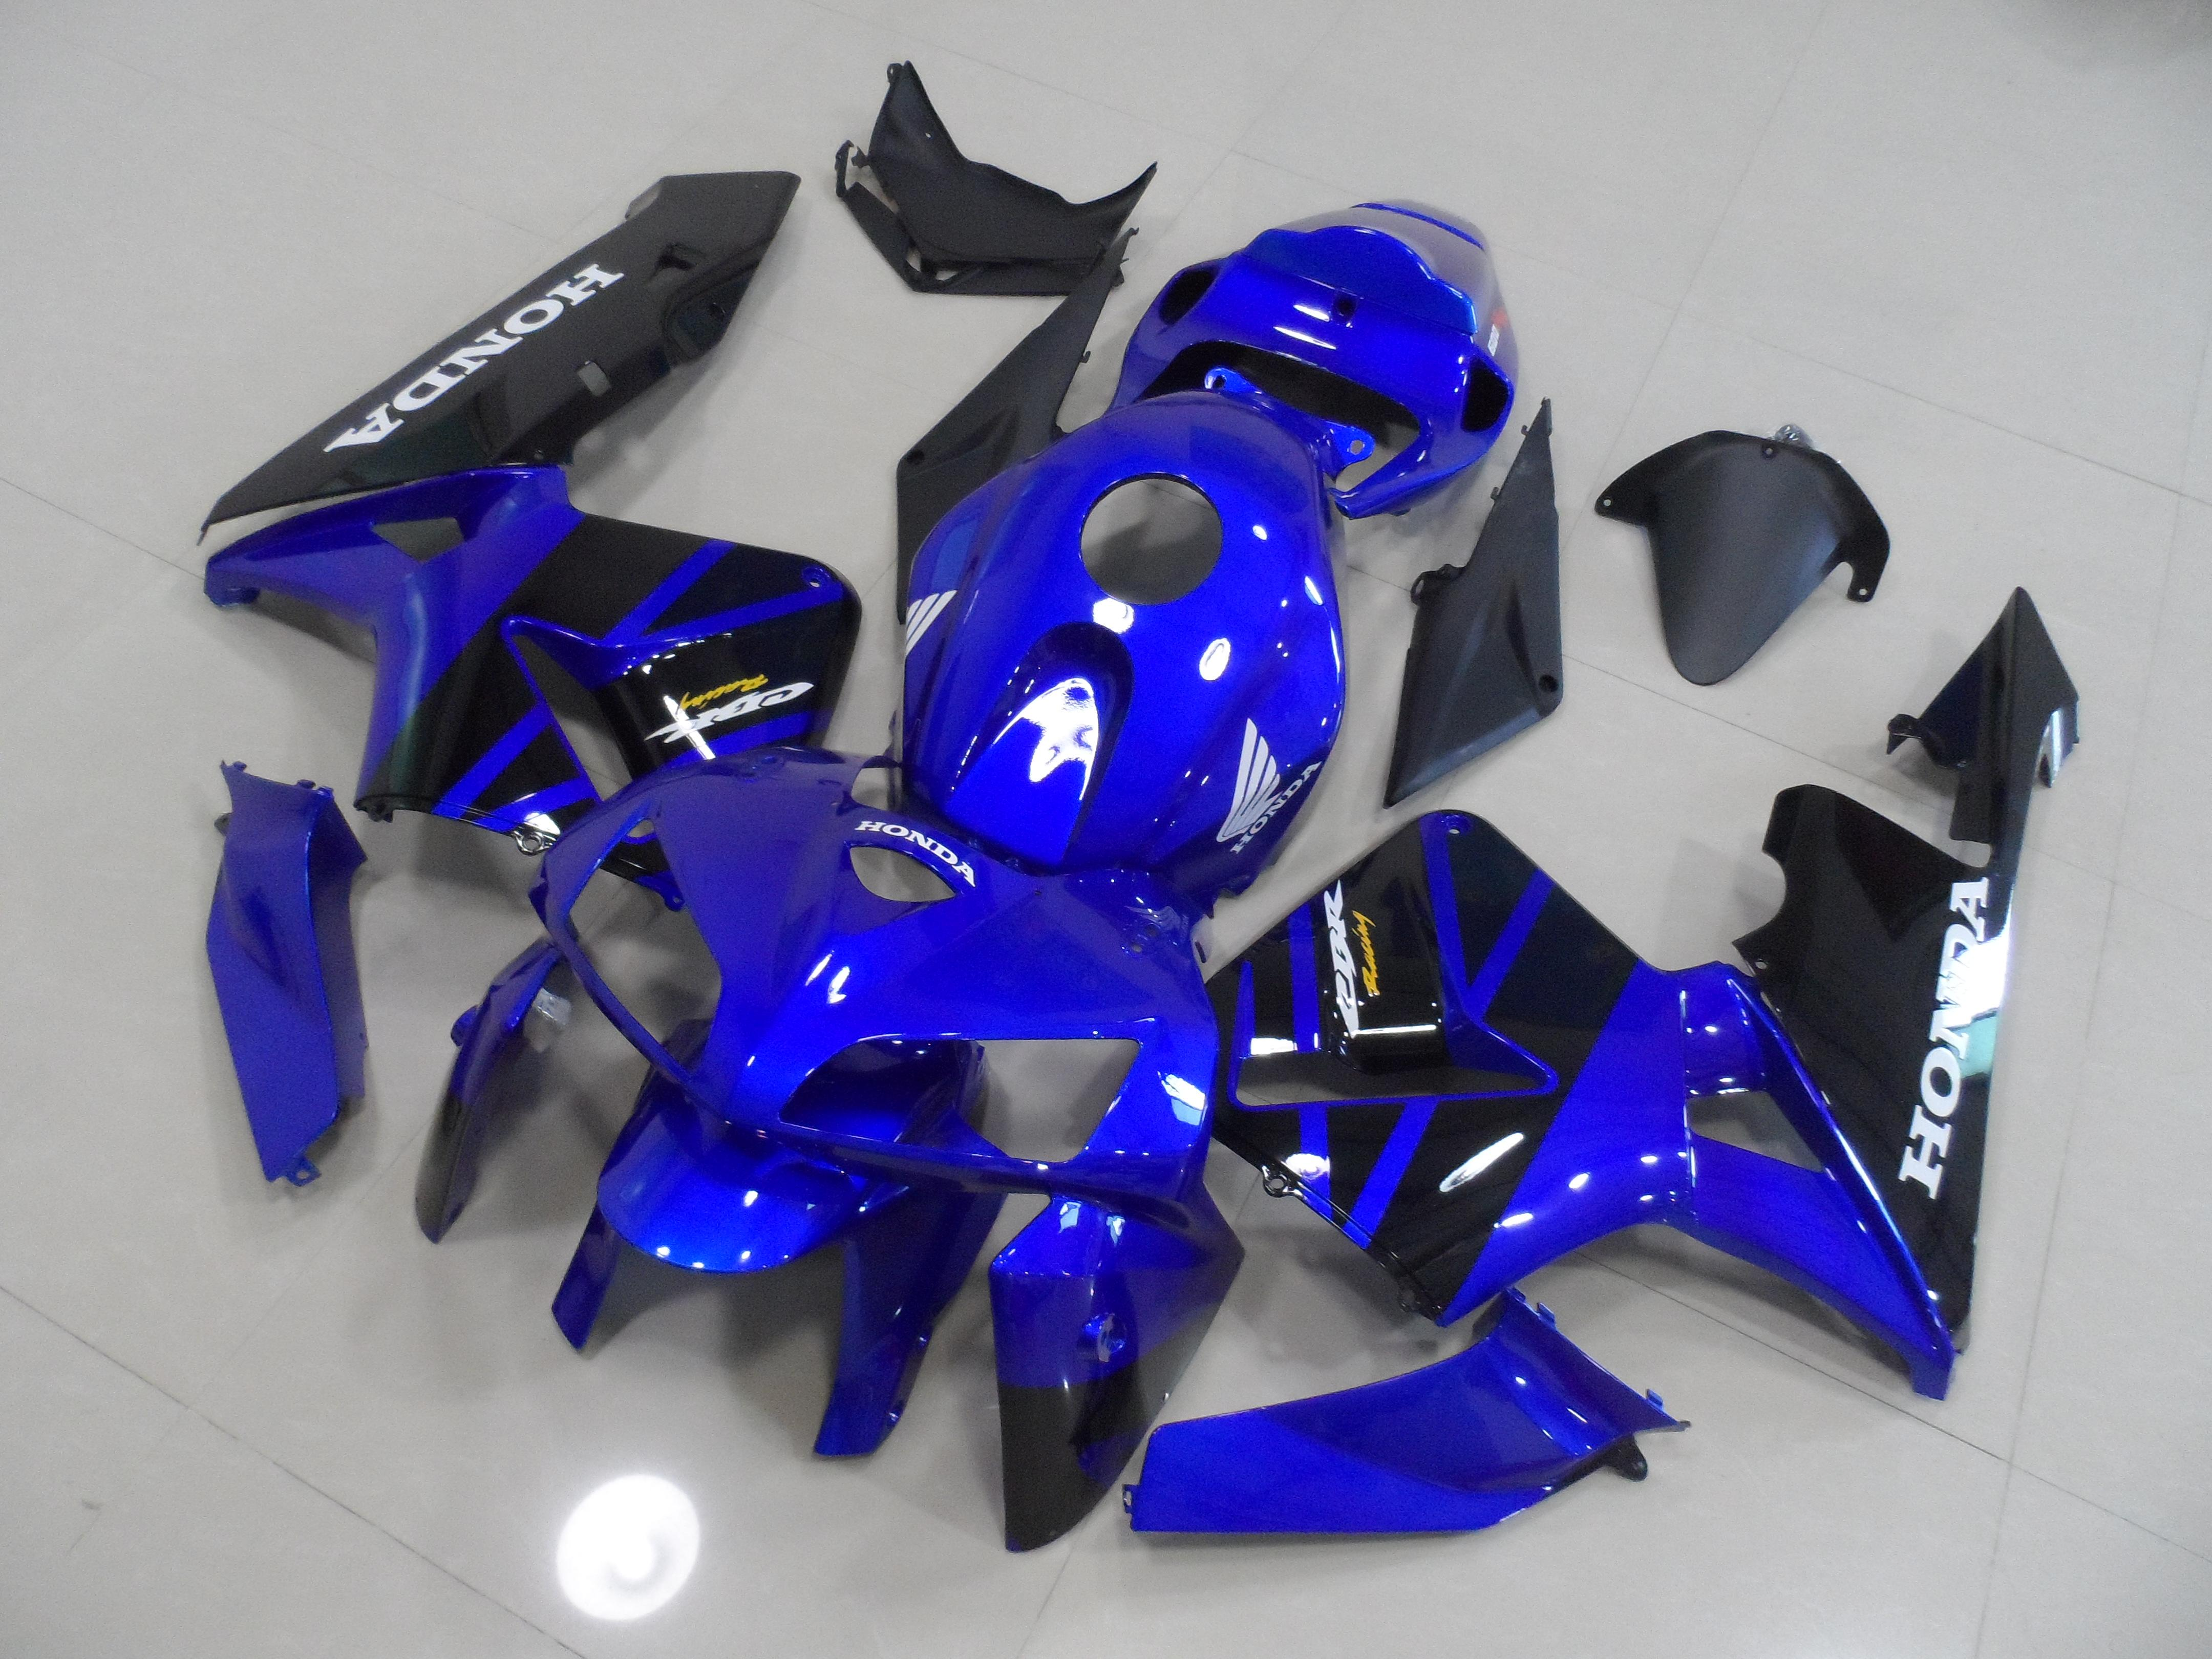 CBR600RR 2005-2006 BLUE&BLACK